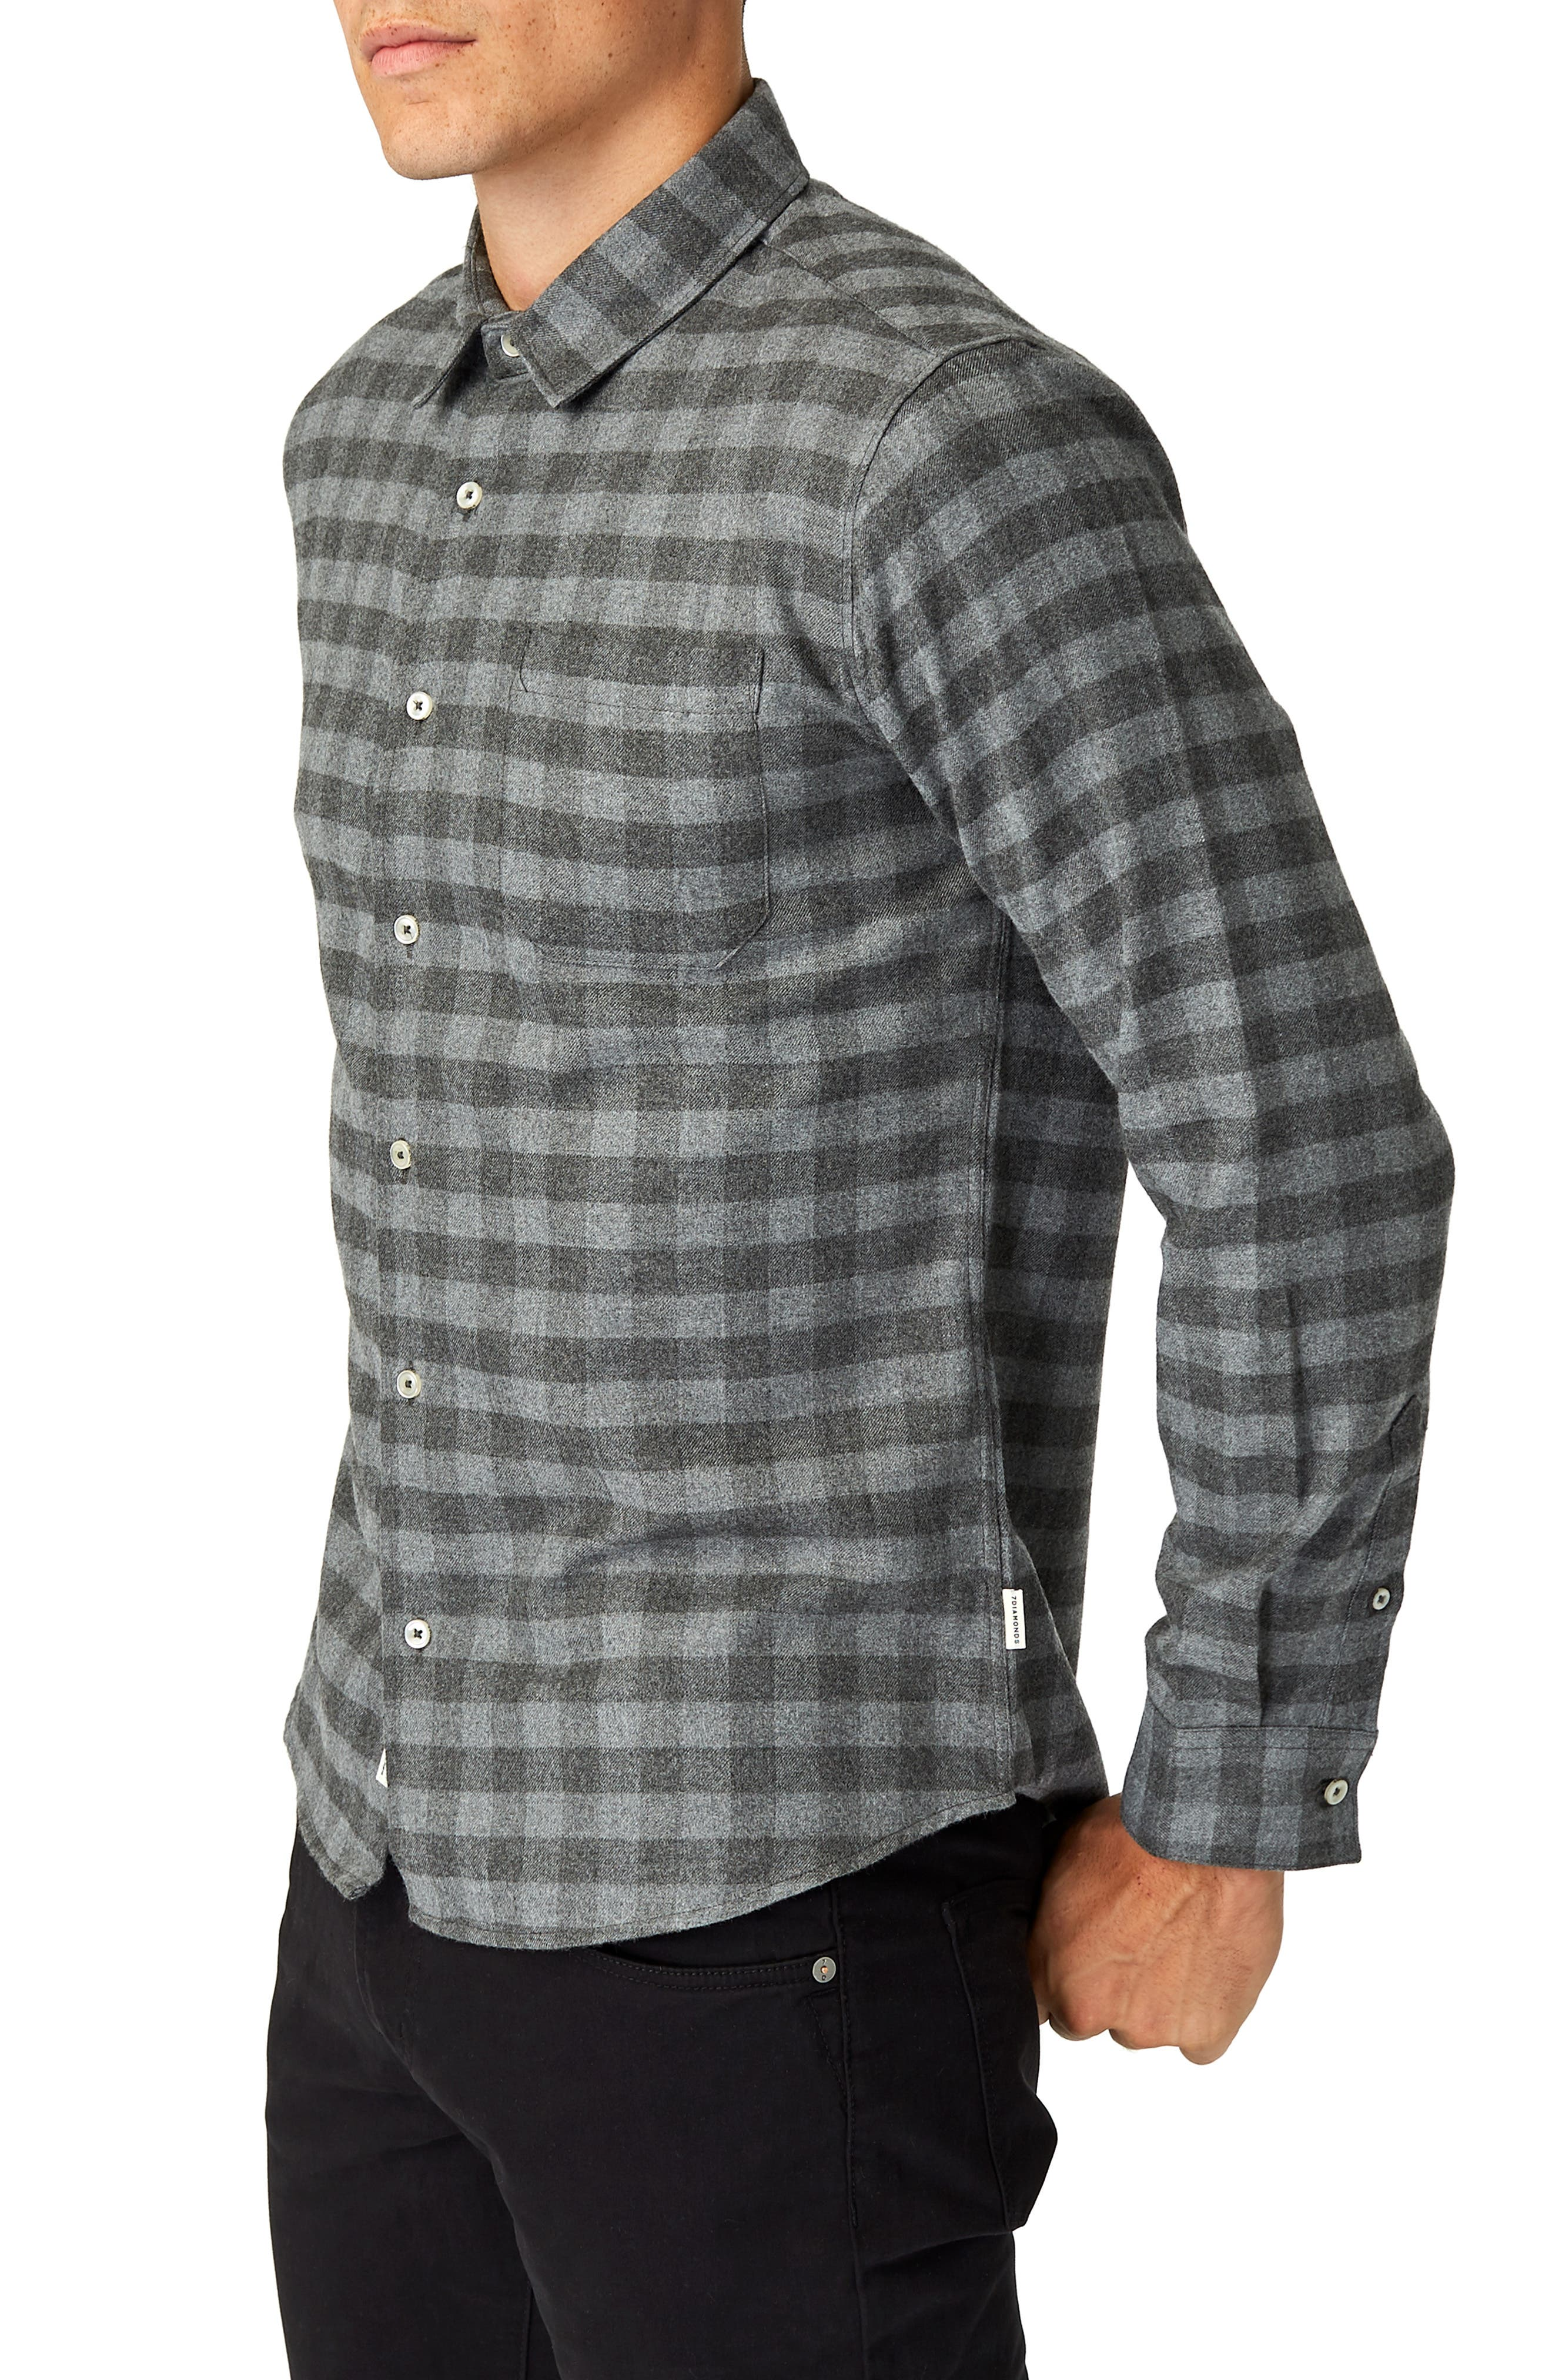 Asher Trim Fit Flannel Shirt,                             Alternate thumbnail 4, color,                             GREY